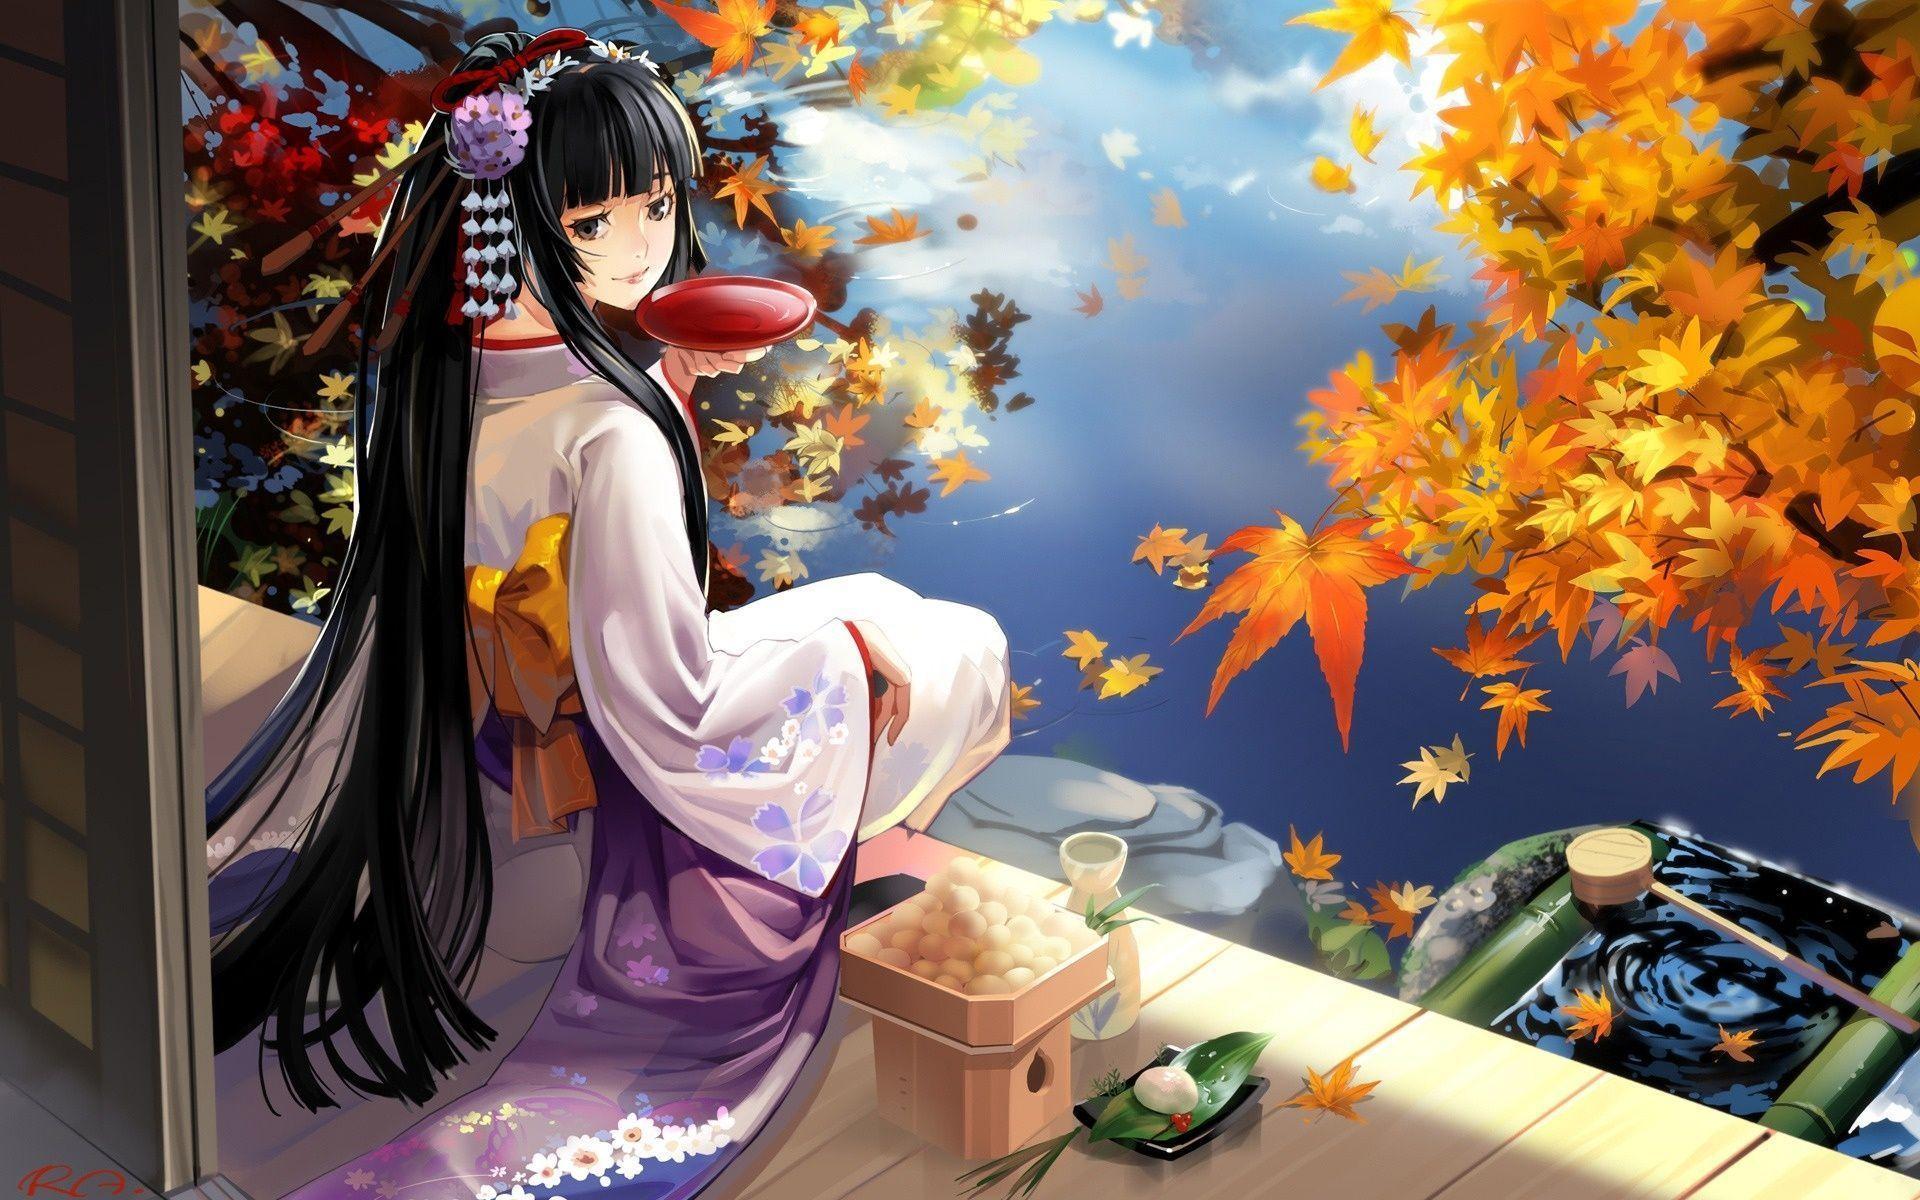 Japanese Anime Art Wallpapers - Top Free Japanese Anime Art